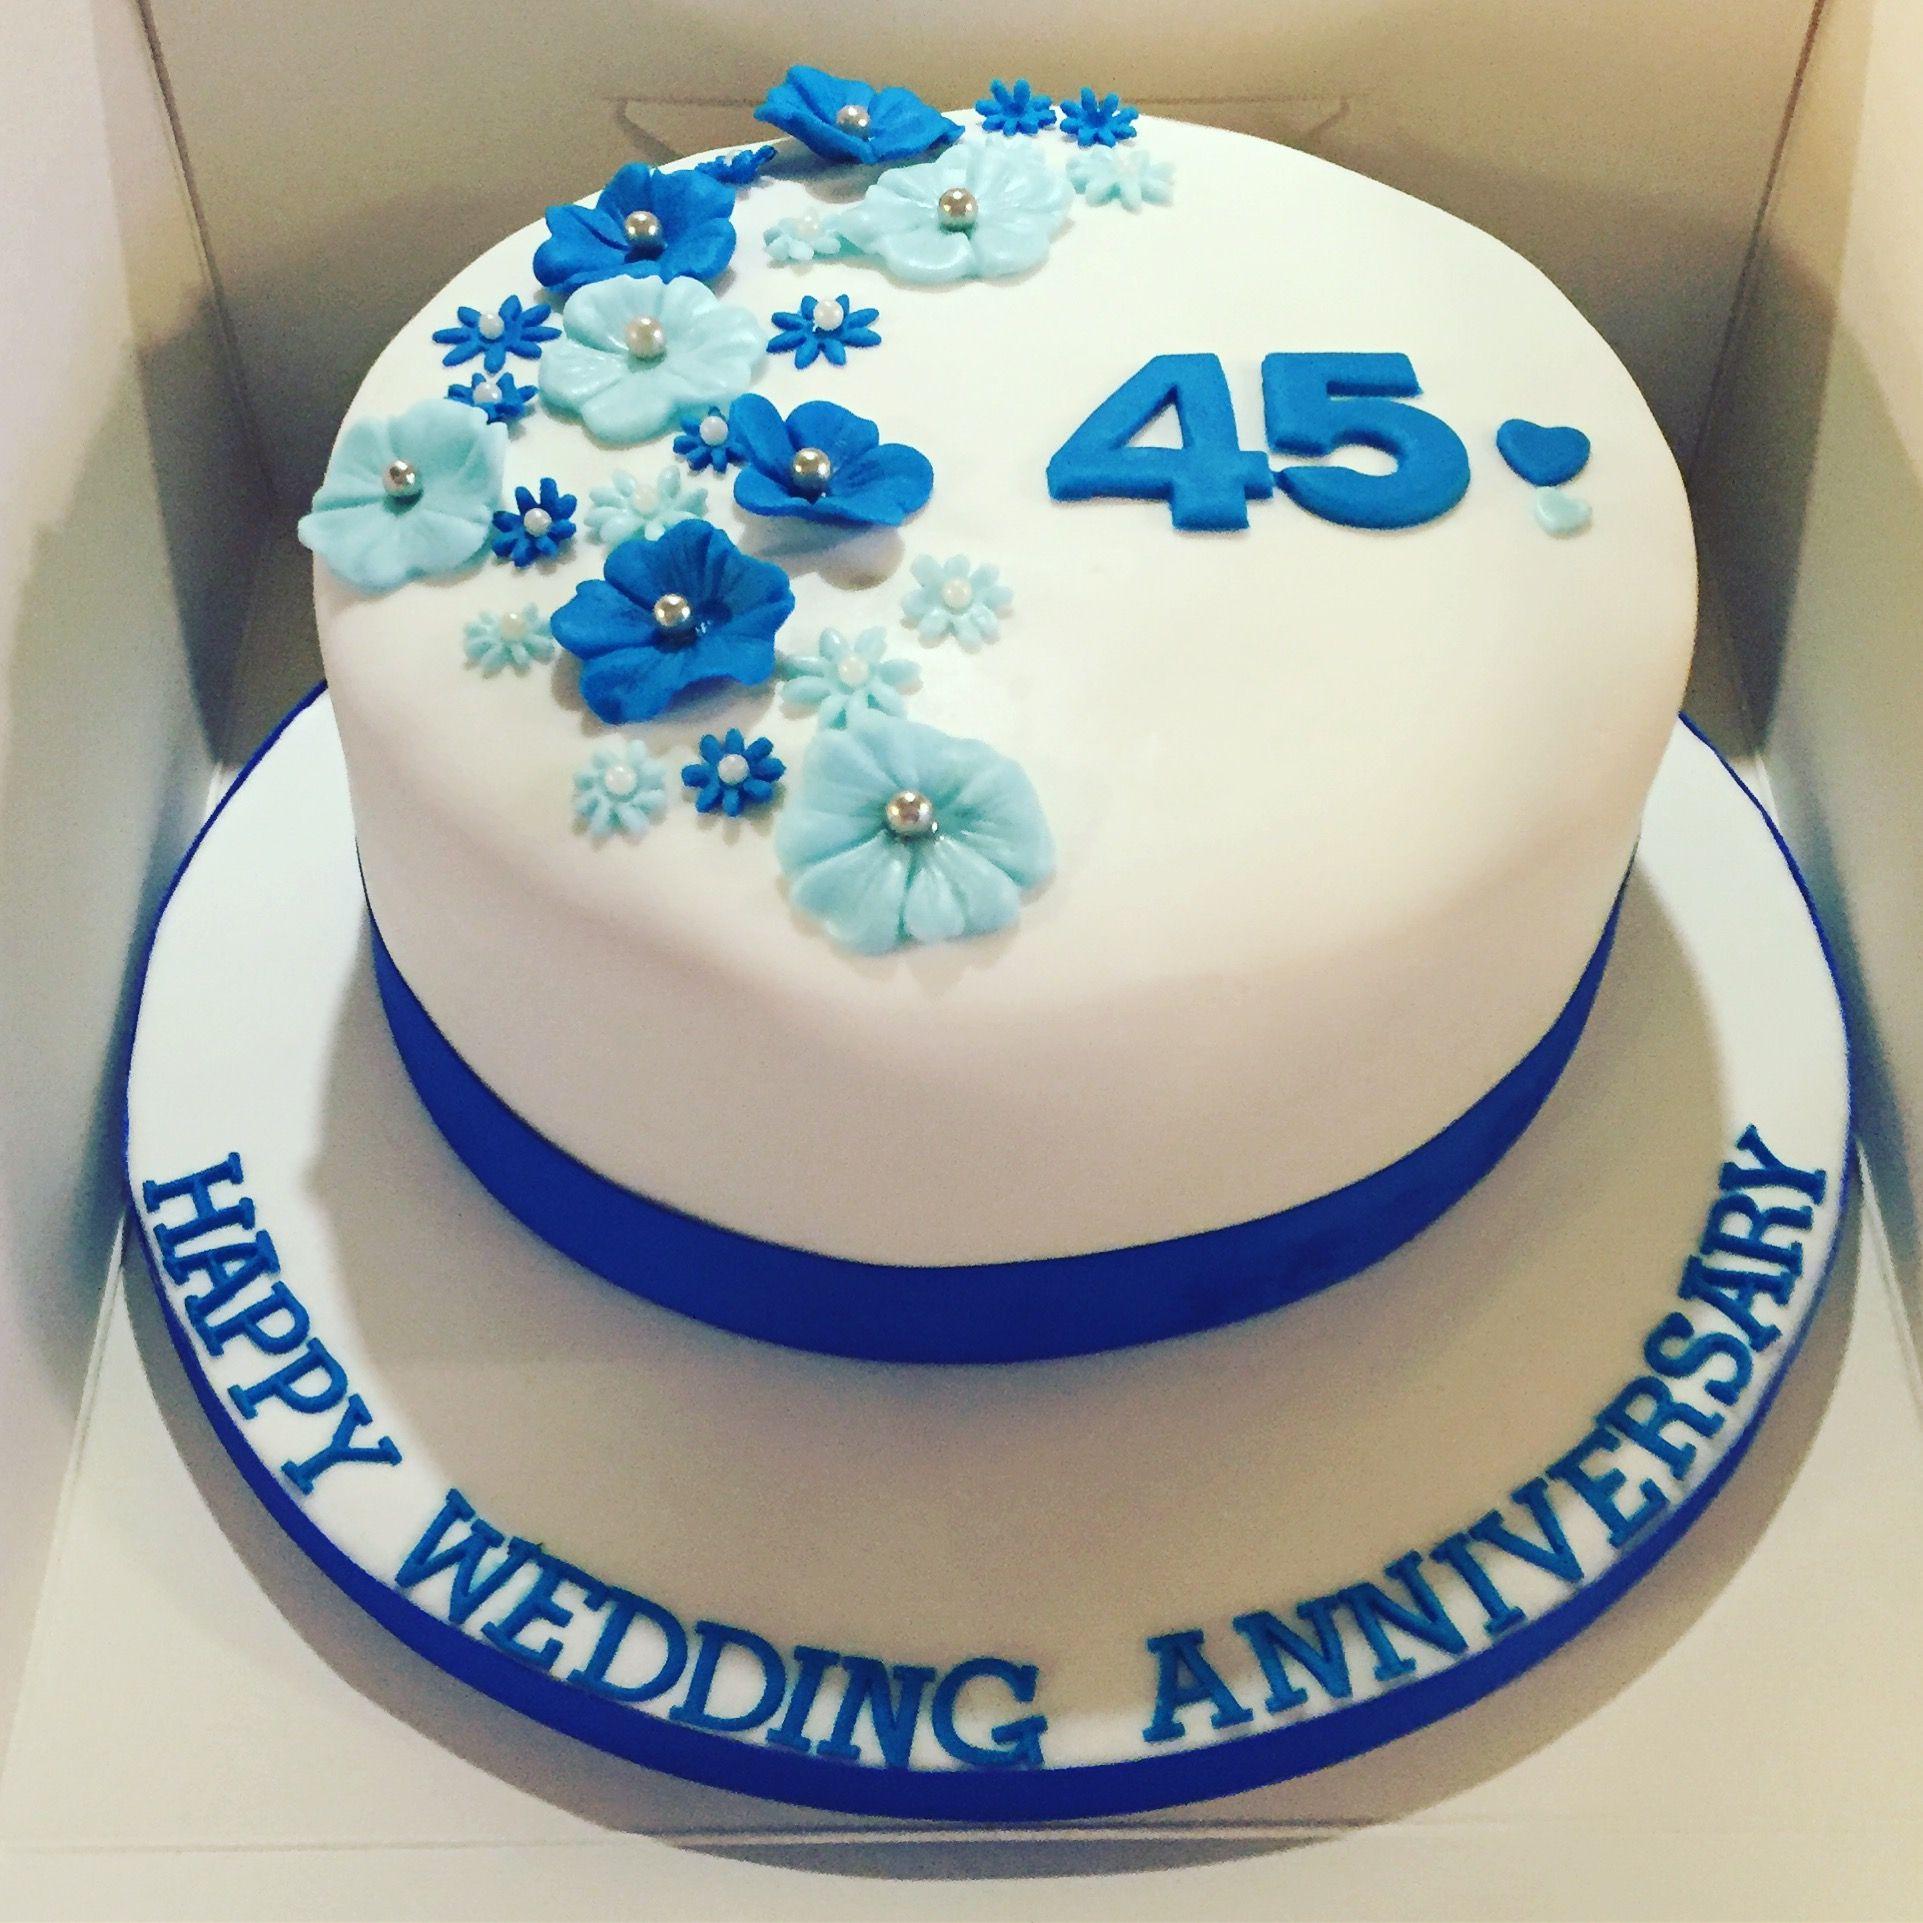 45th wedding anniversary cake blueflowers